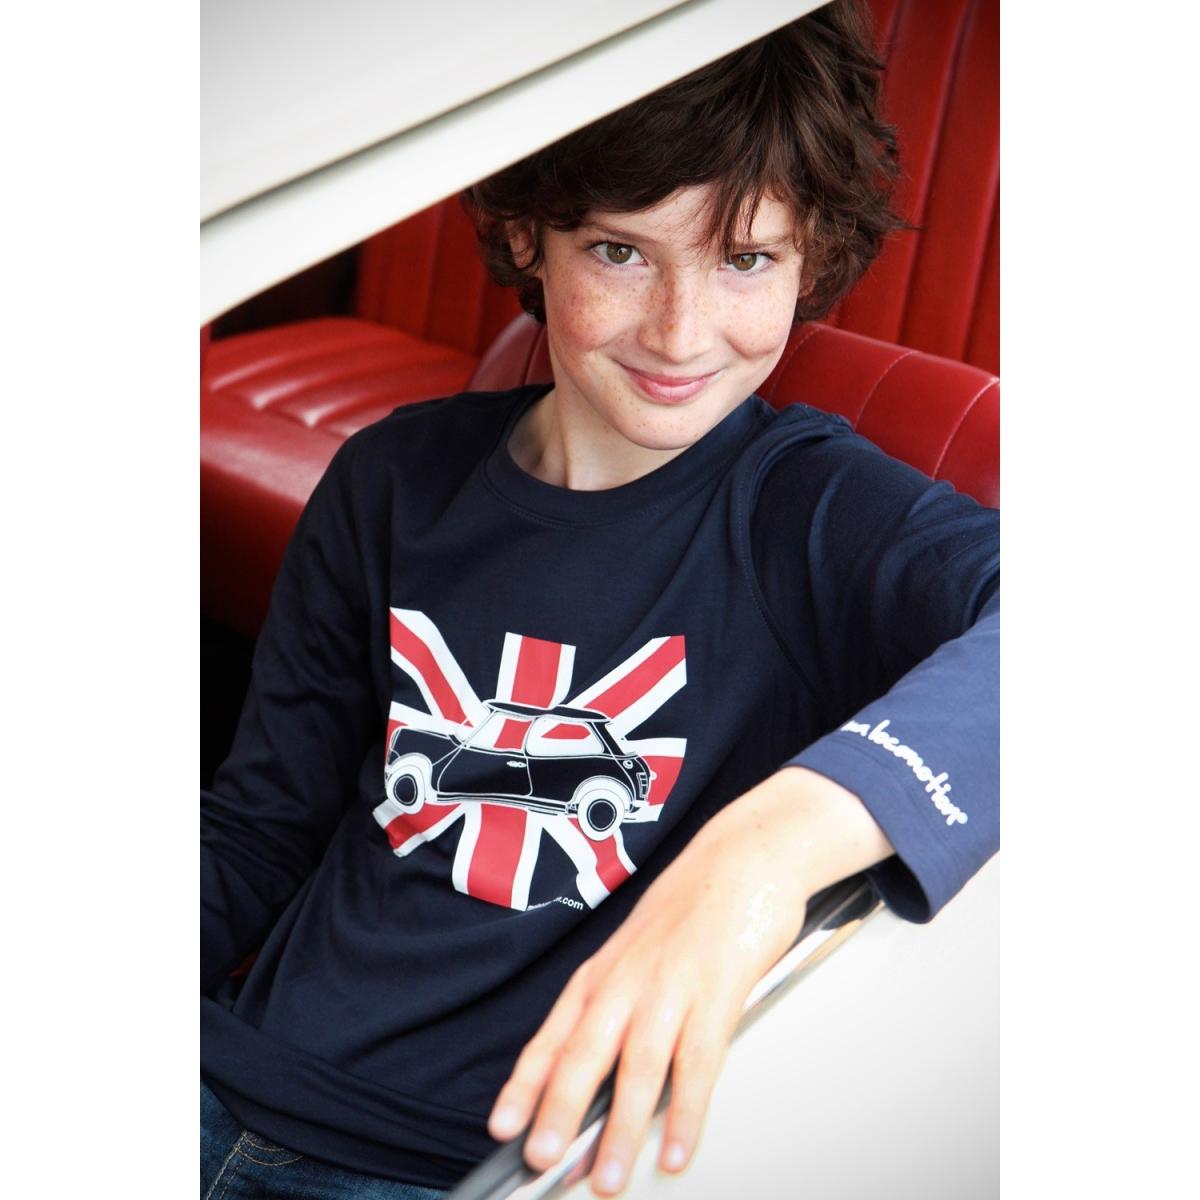 Long sleeves Austin Mini Union Jack t-shirt for kids